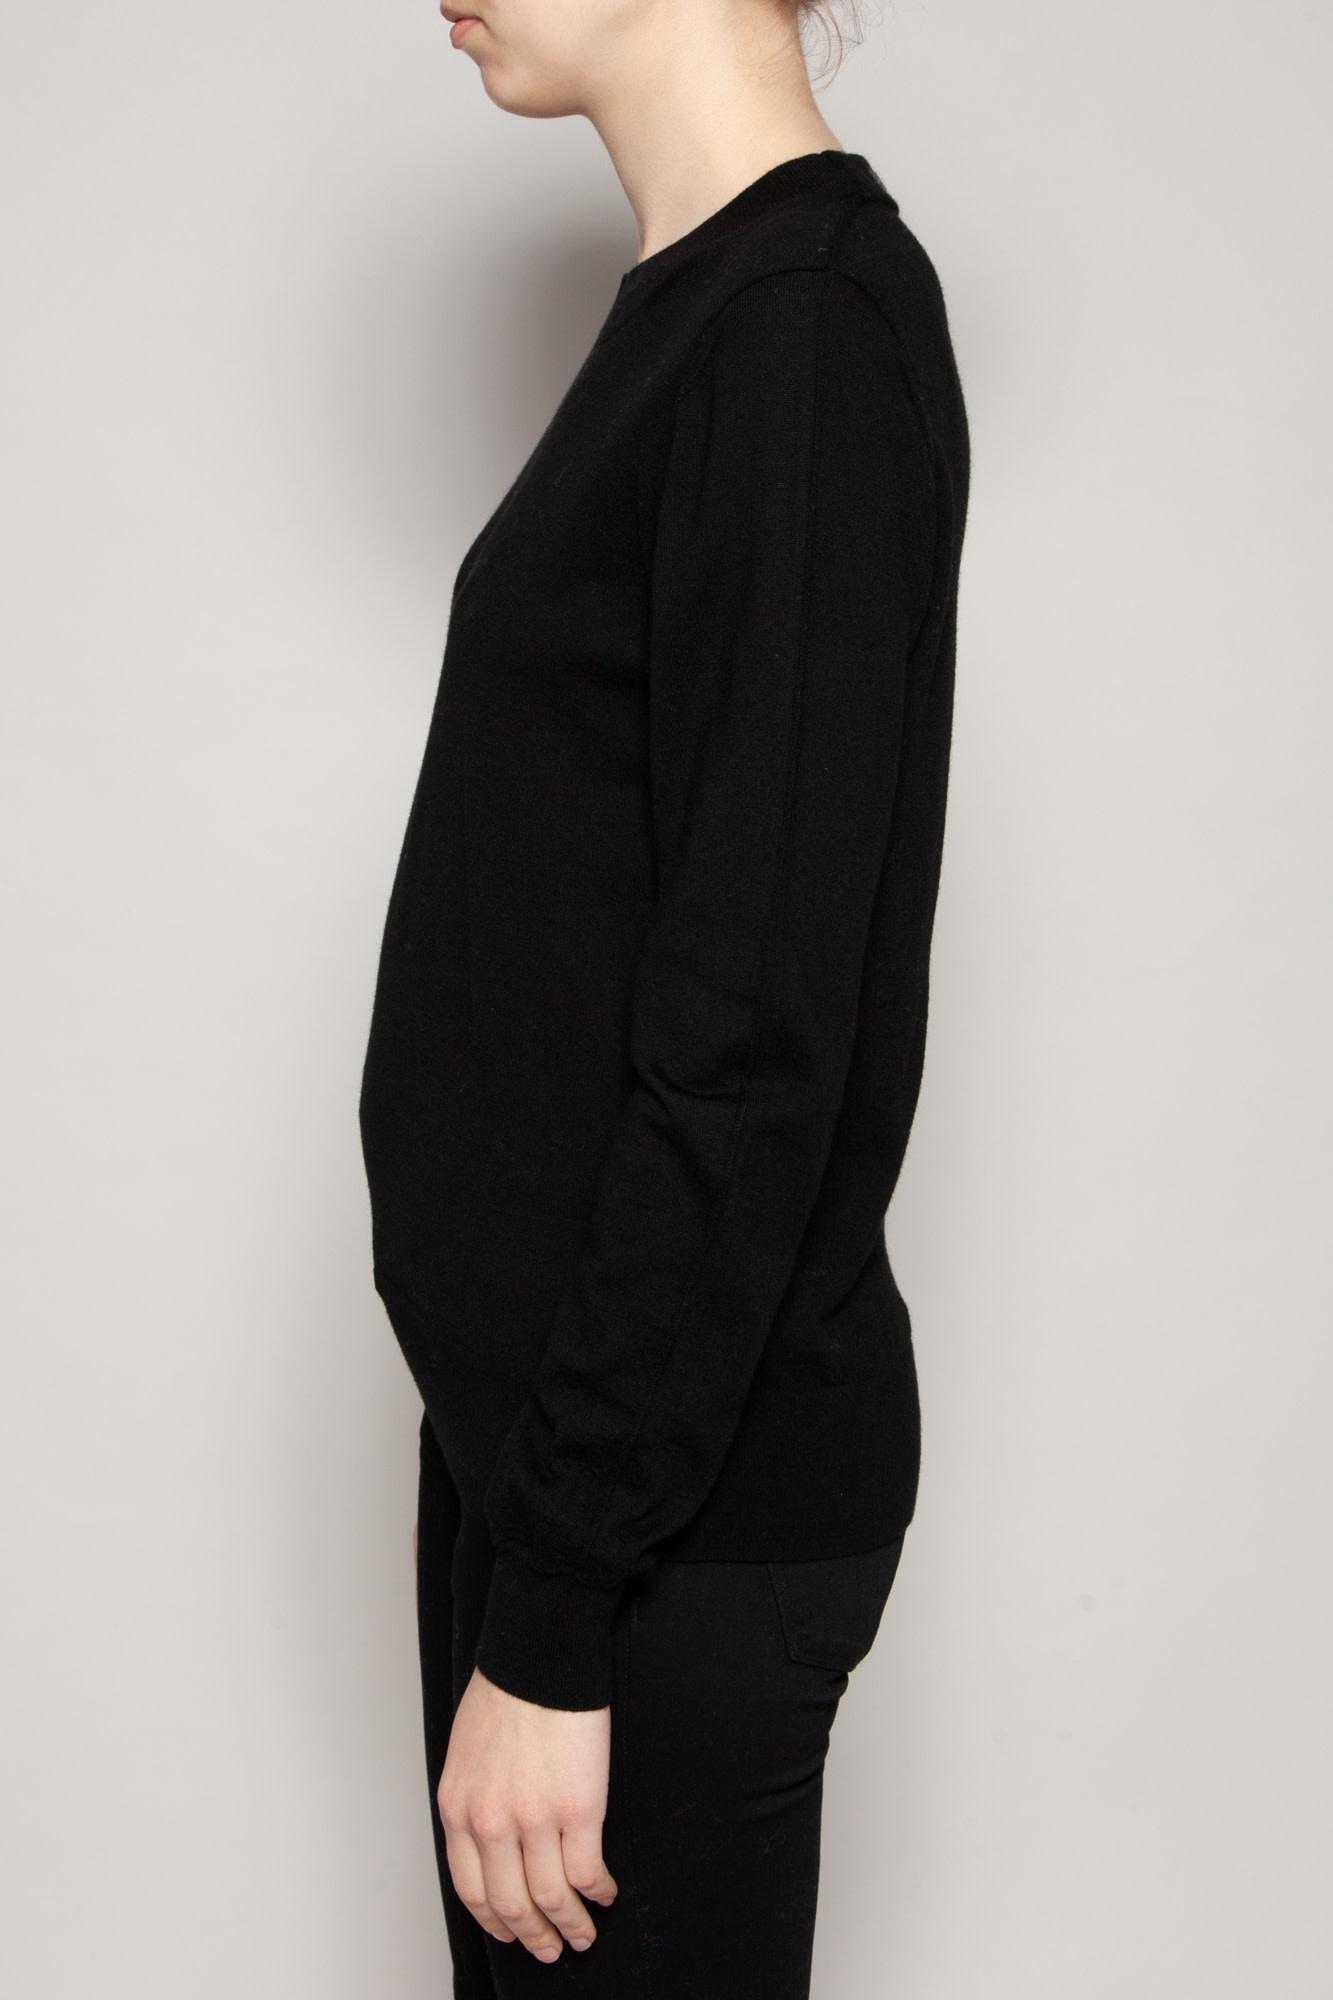 Burberry BLACK WOOL SWEATER